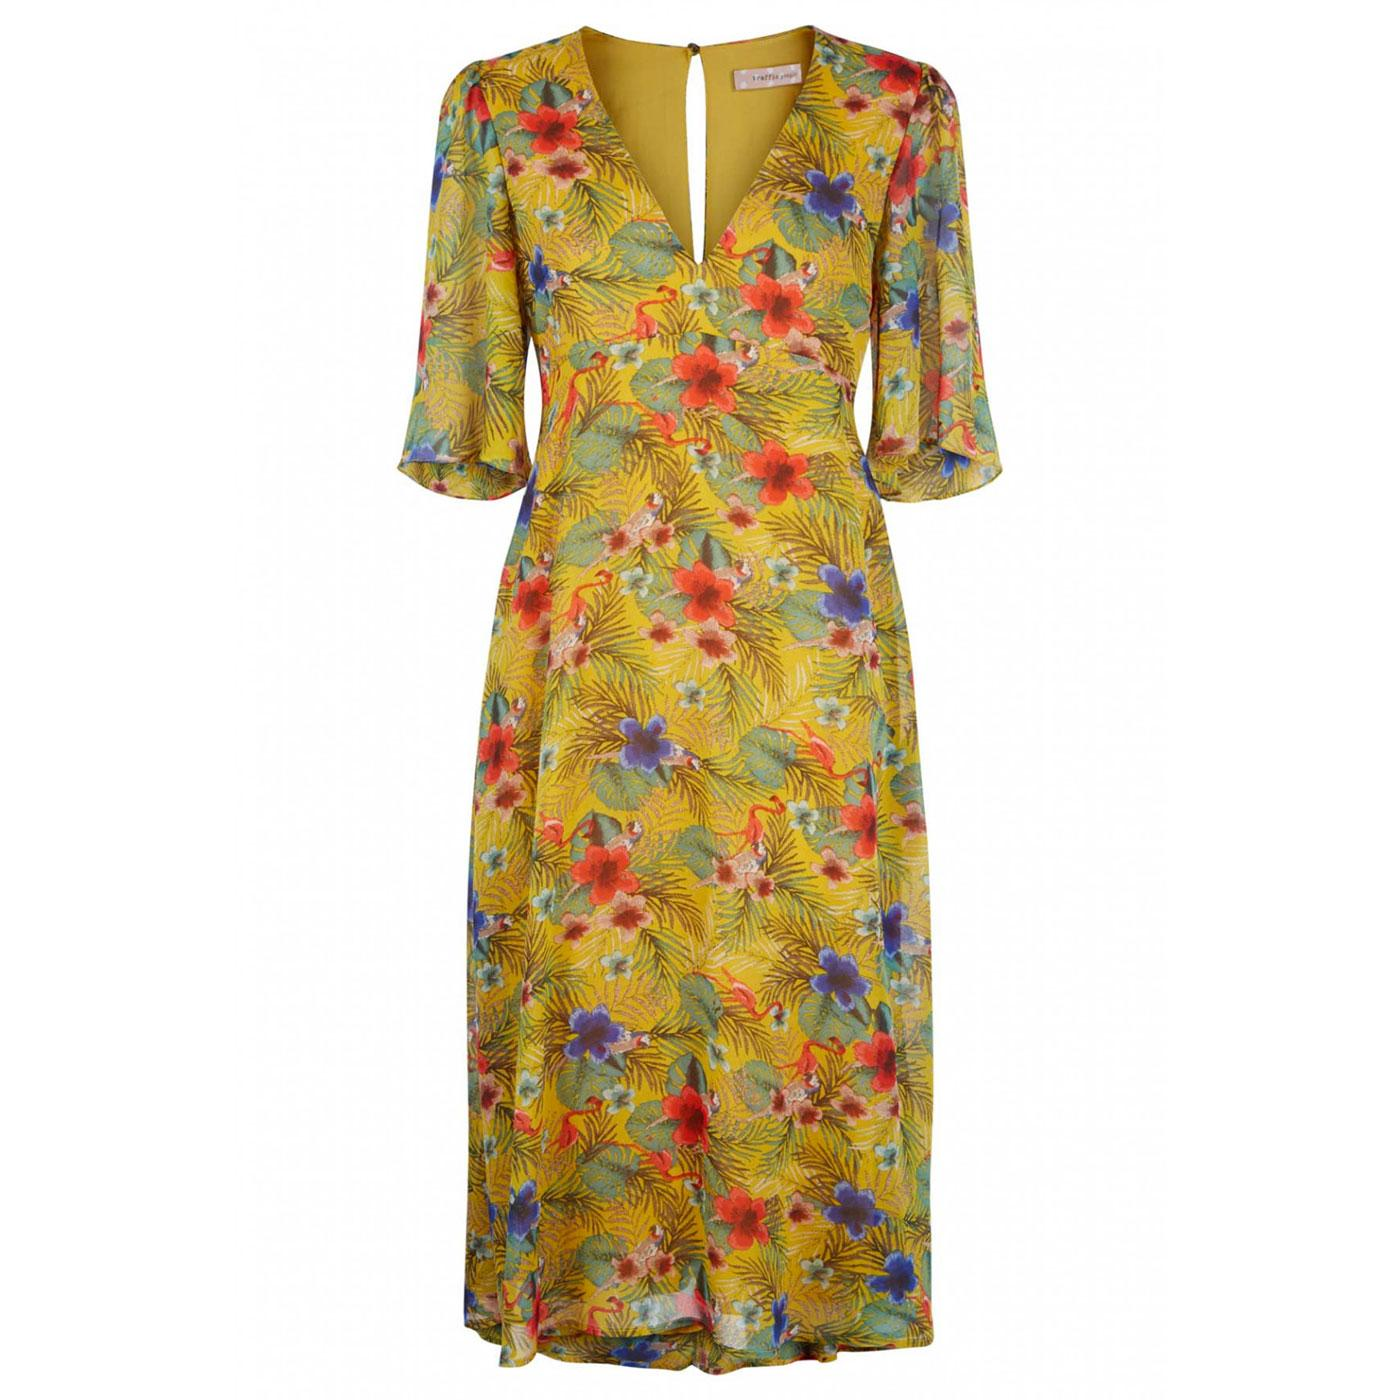 Blithe TRAFFIC PEOPLE Retro 60s Summer Dress